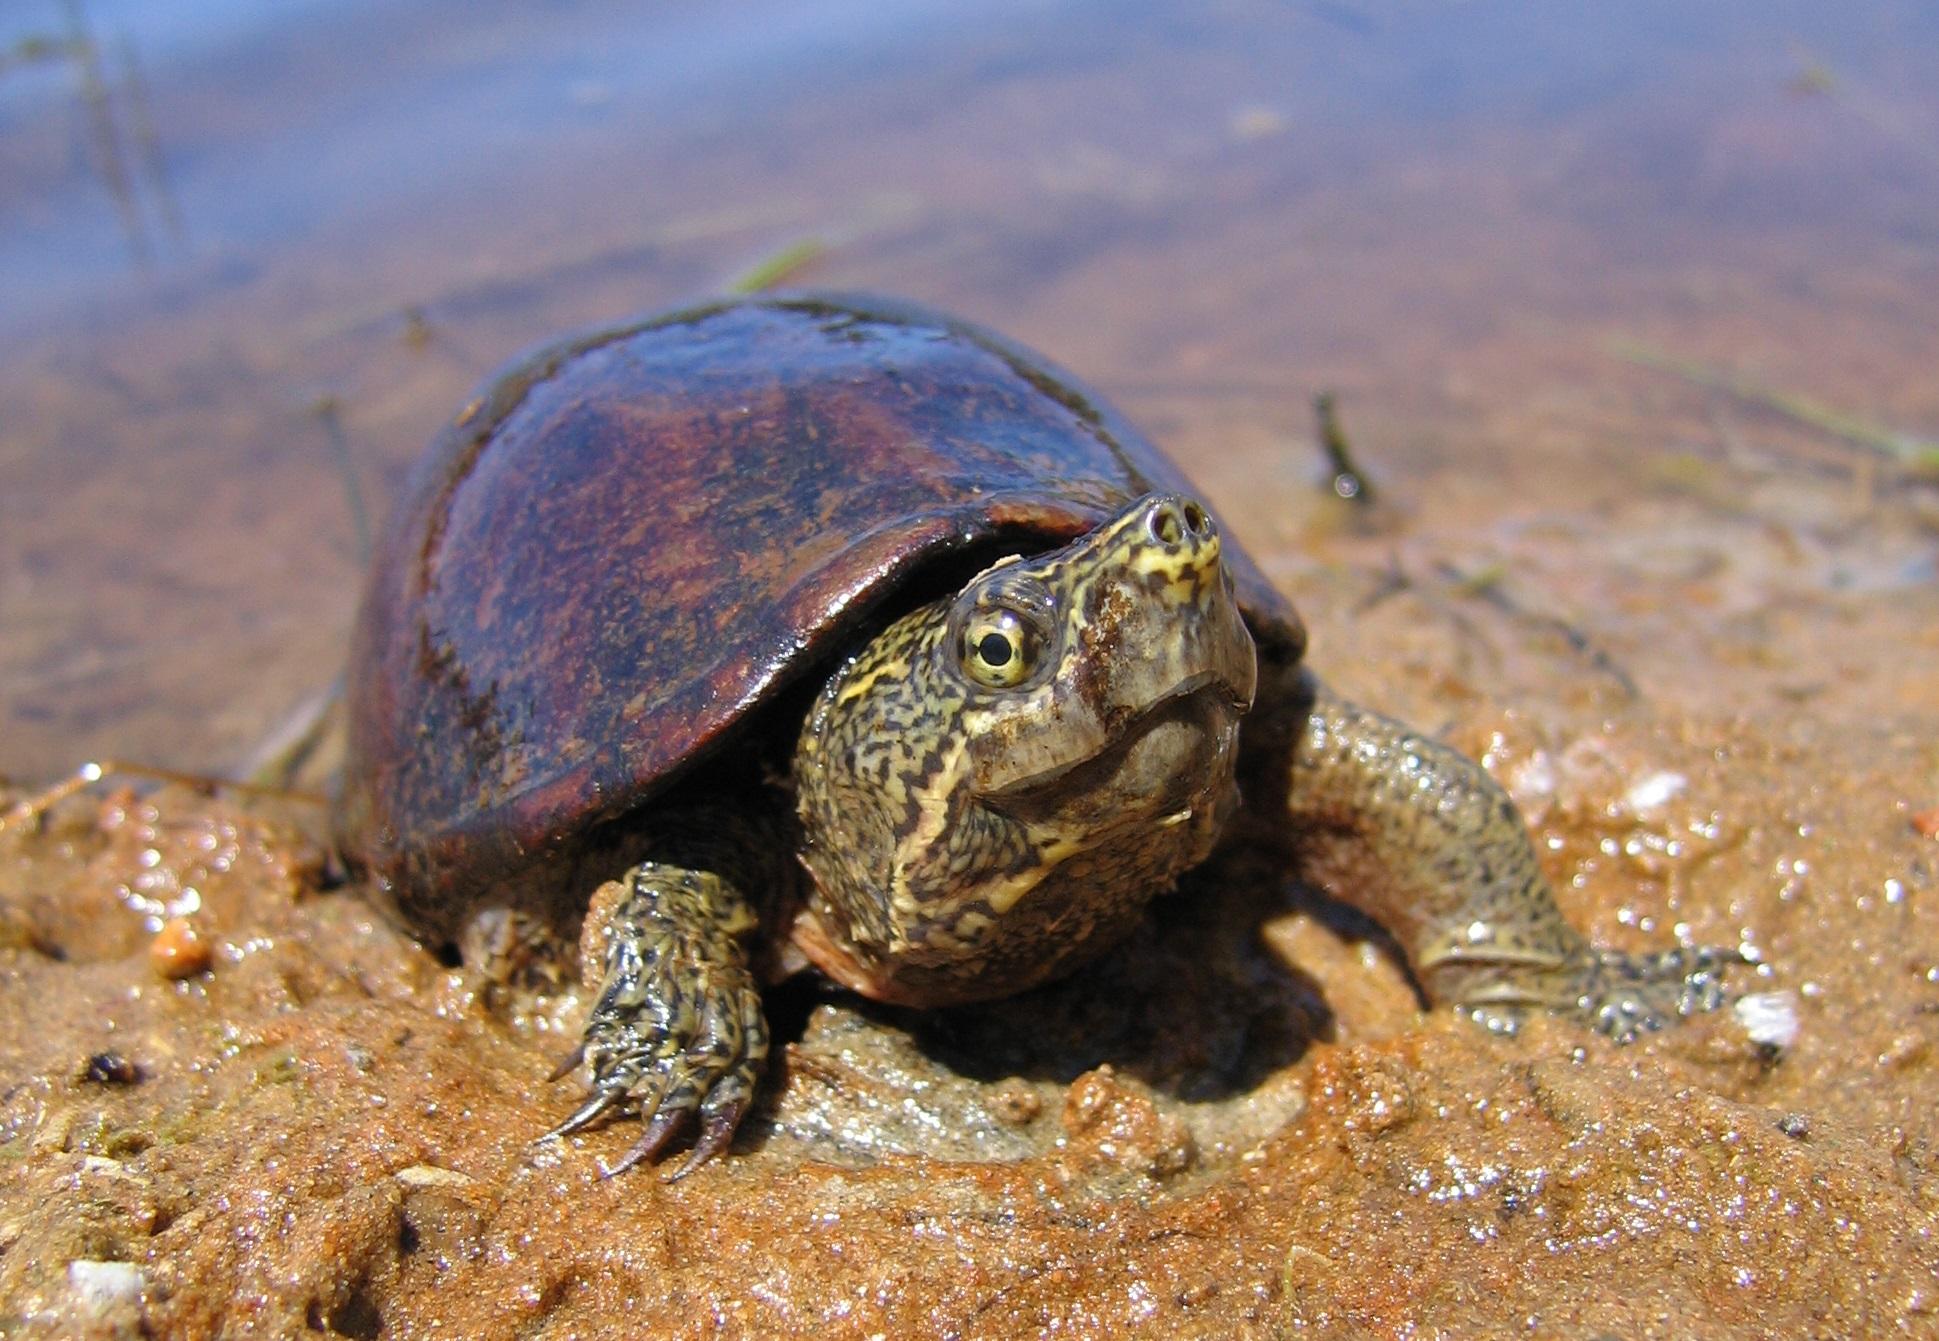 Eastern Muskoka Turtle (Credit: Scott Gillingwater)